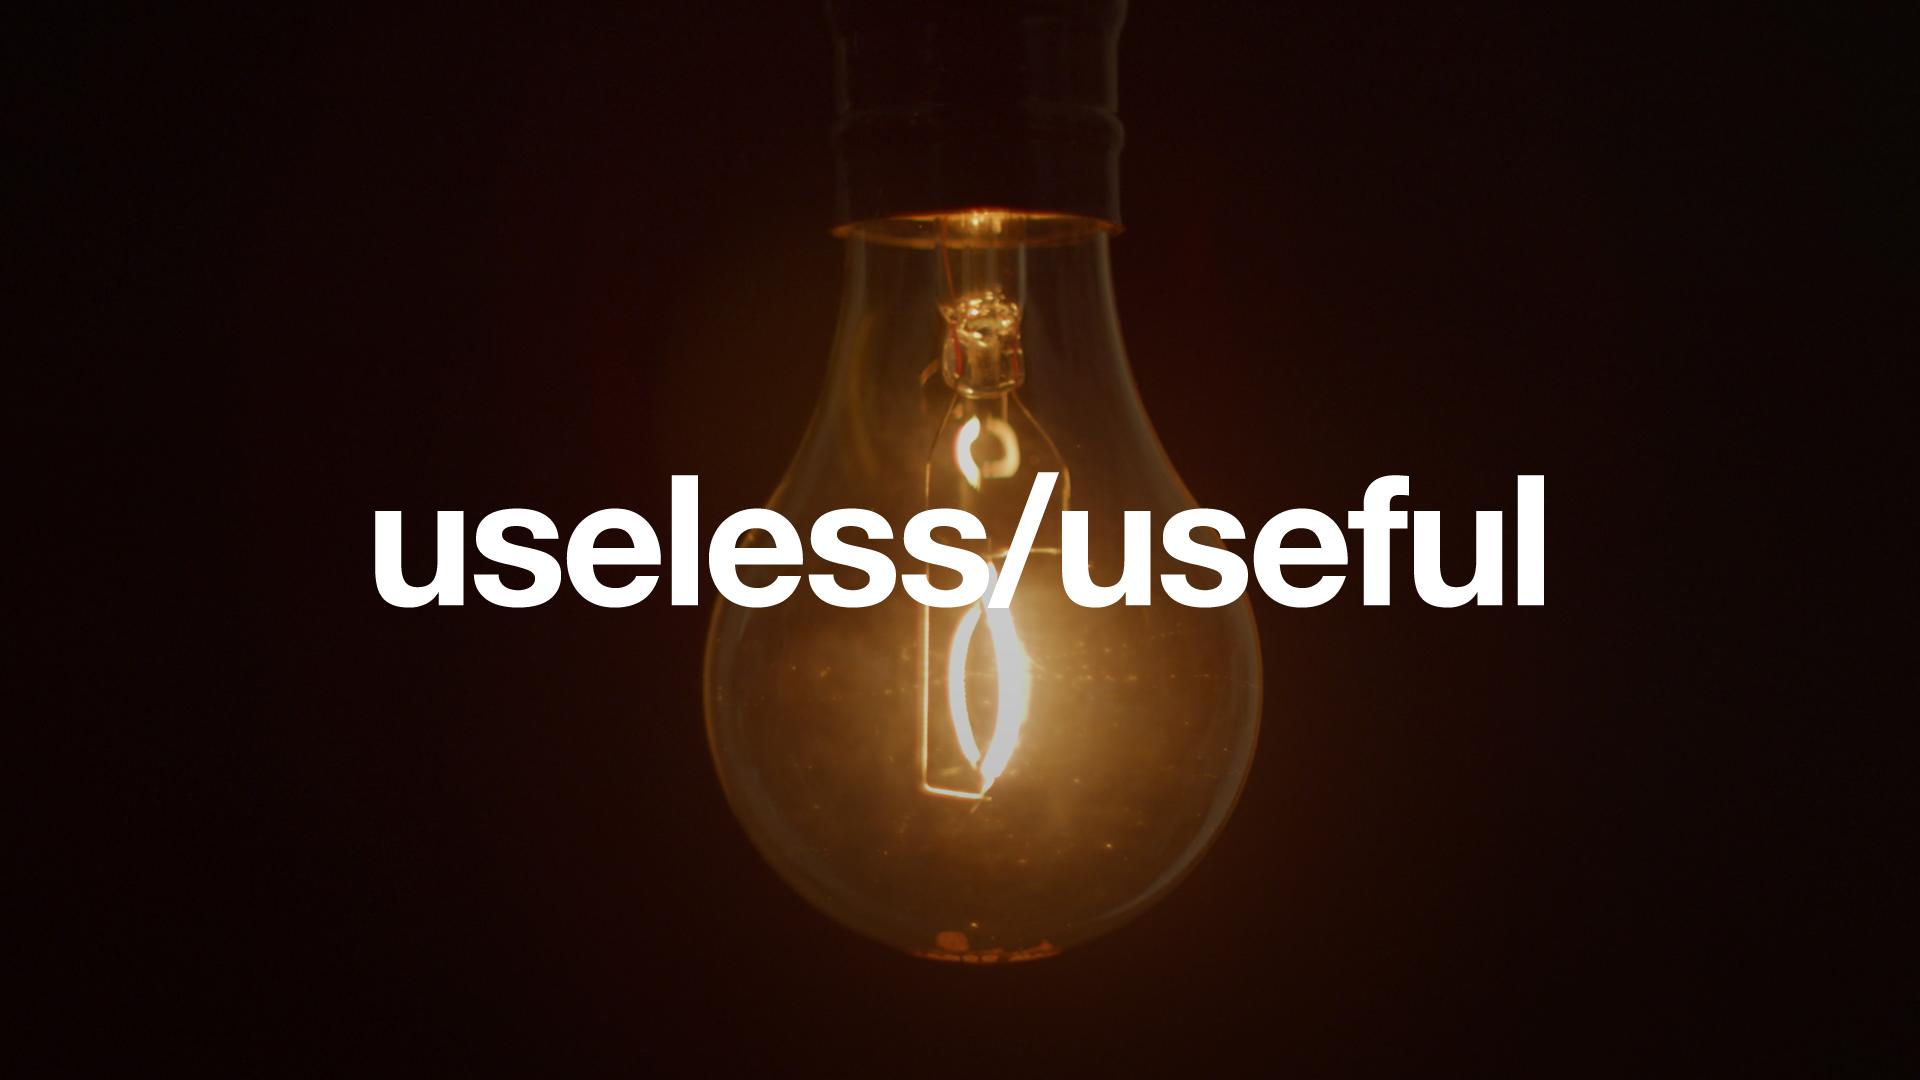 Useless-Useful-Graphic-1080.png